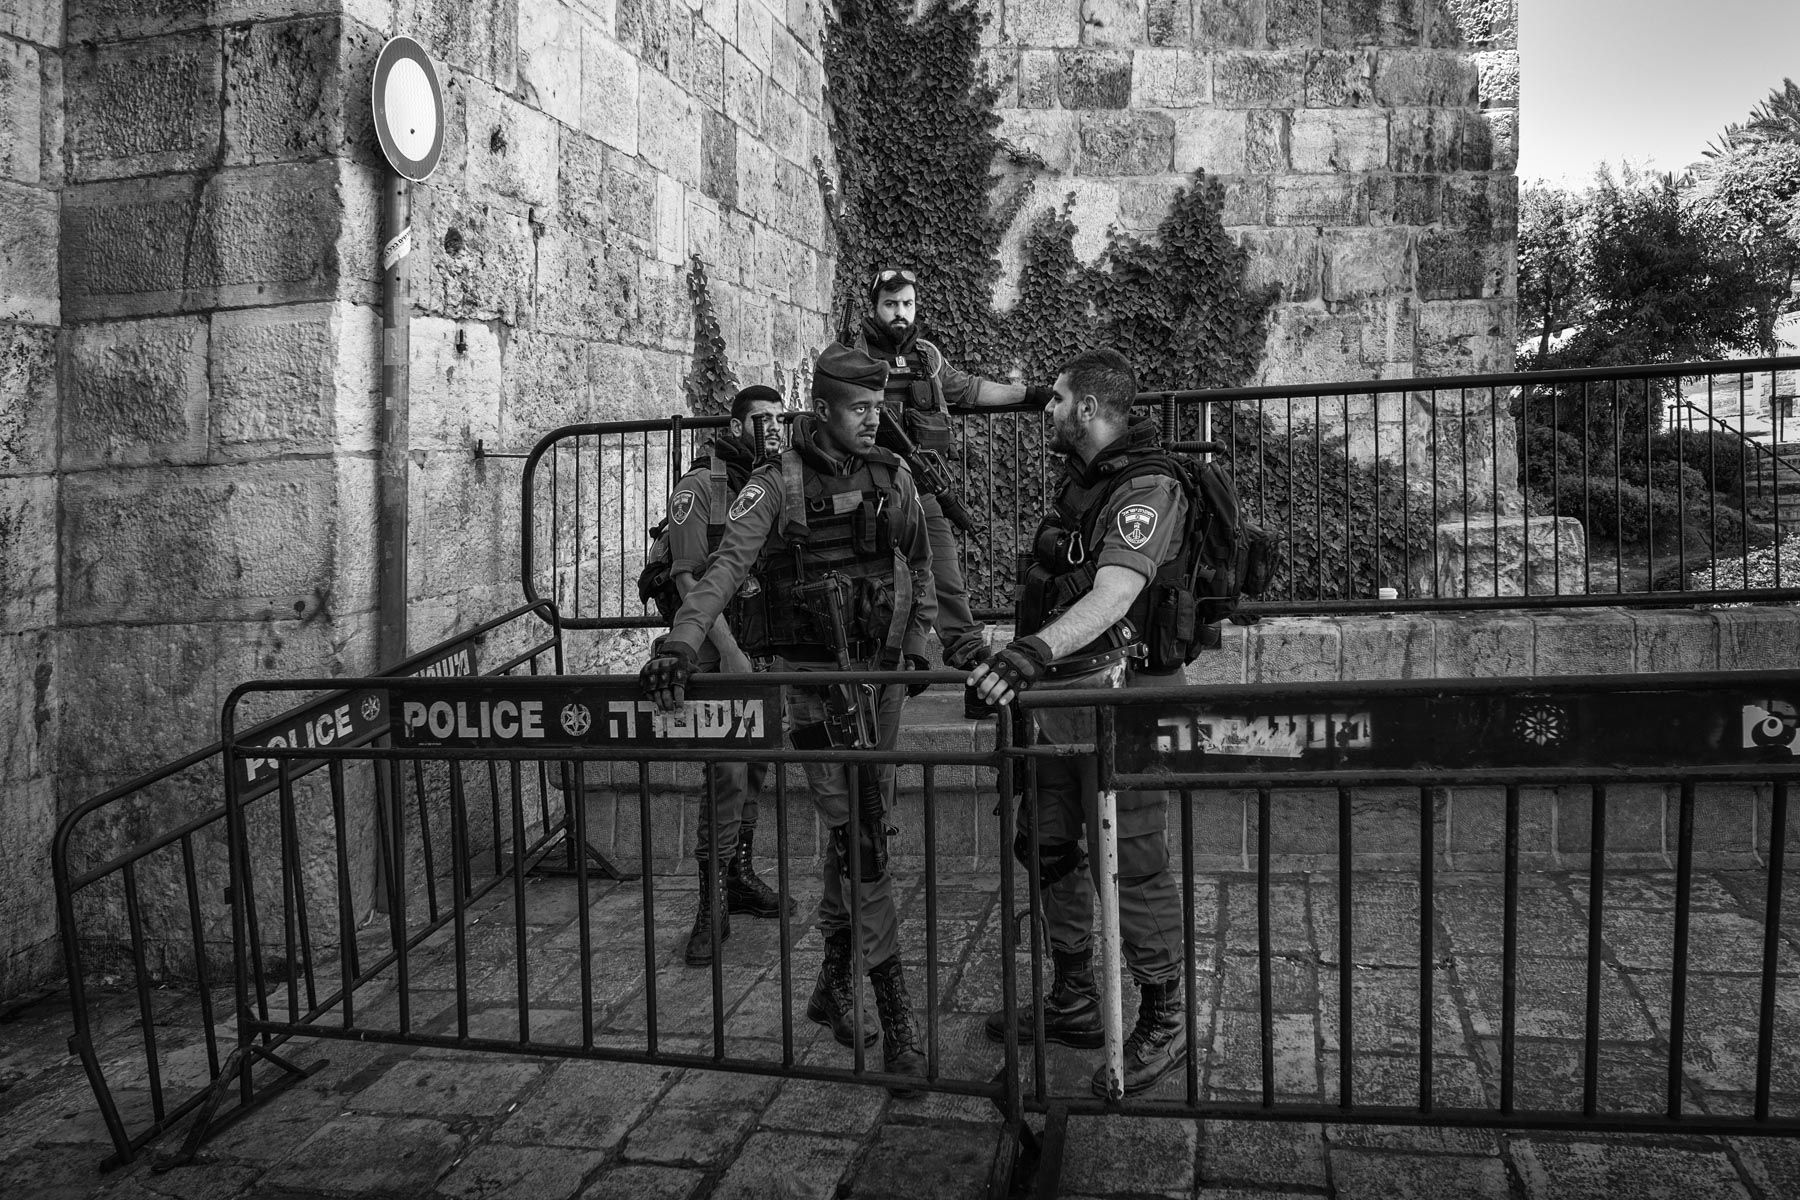 Jerusalem, Israel 05/13/17